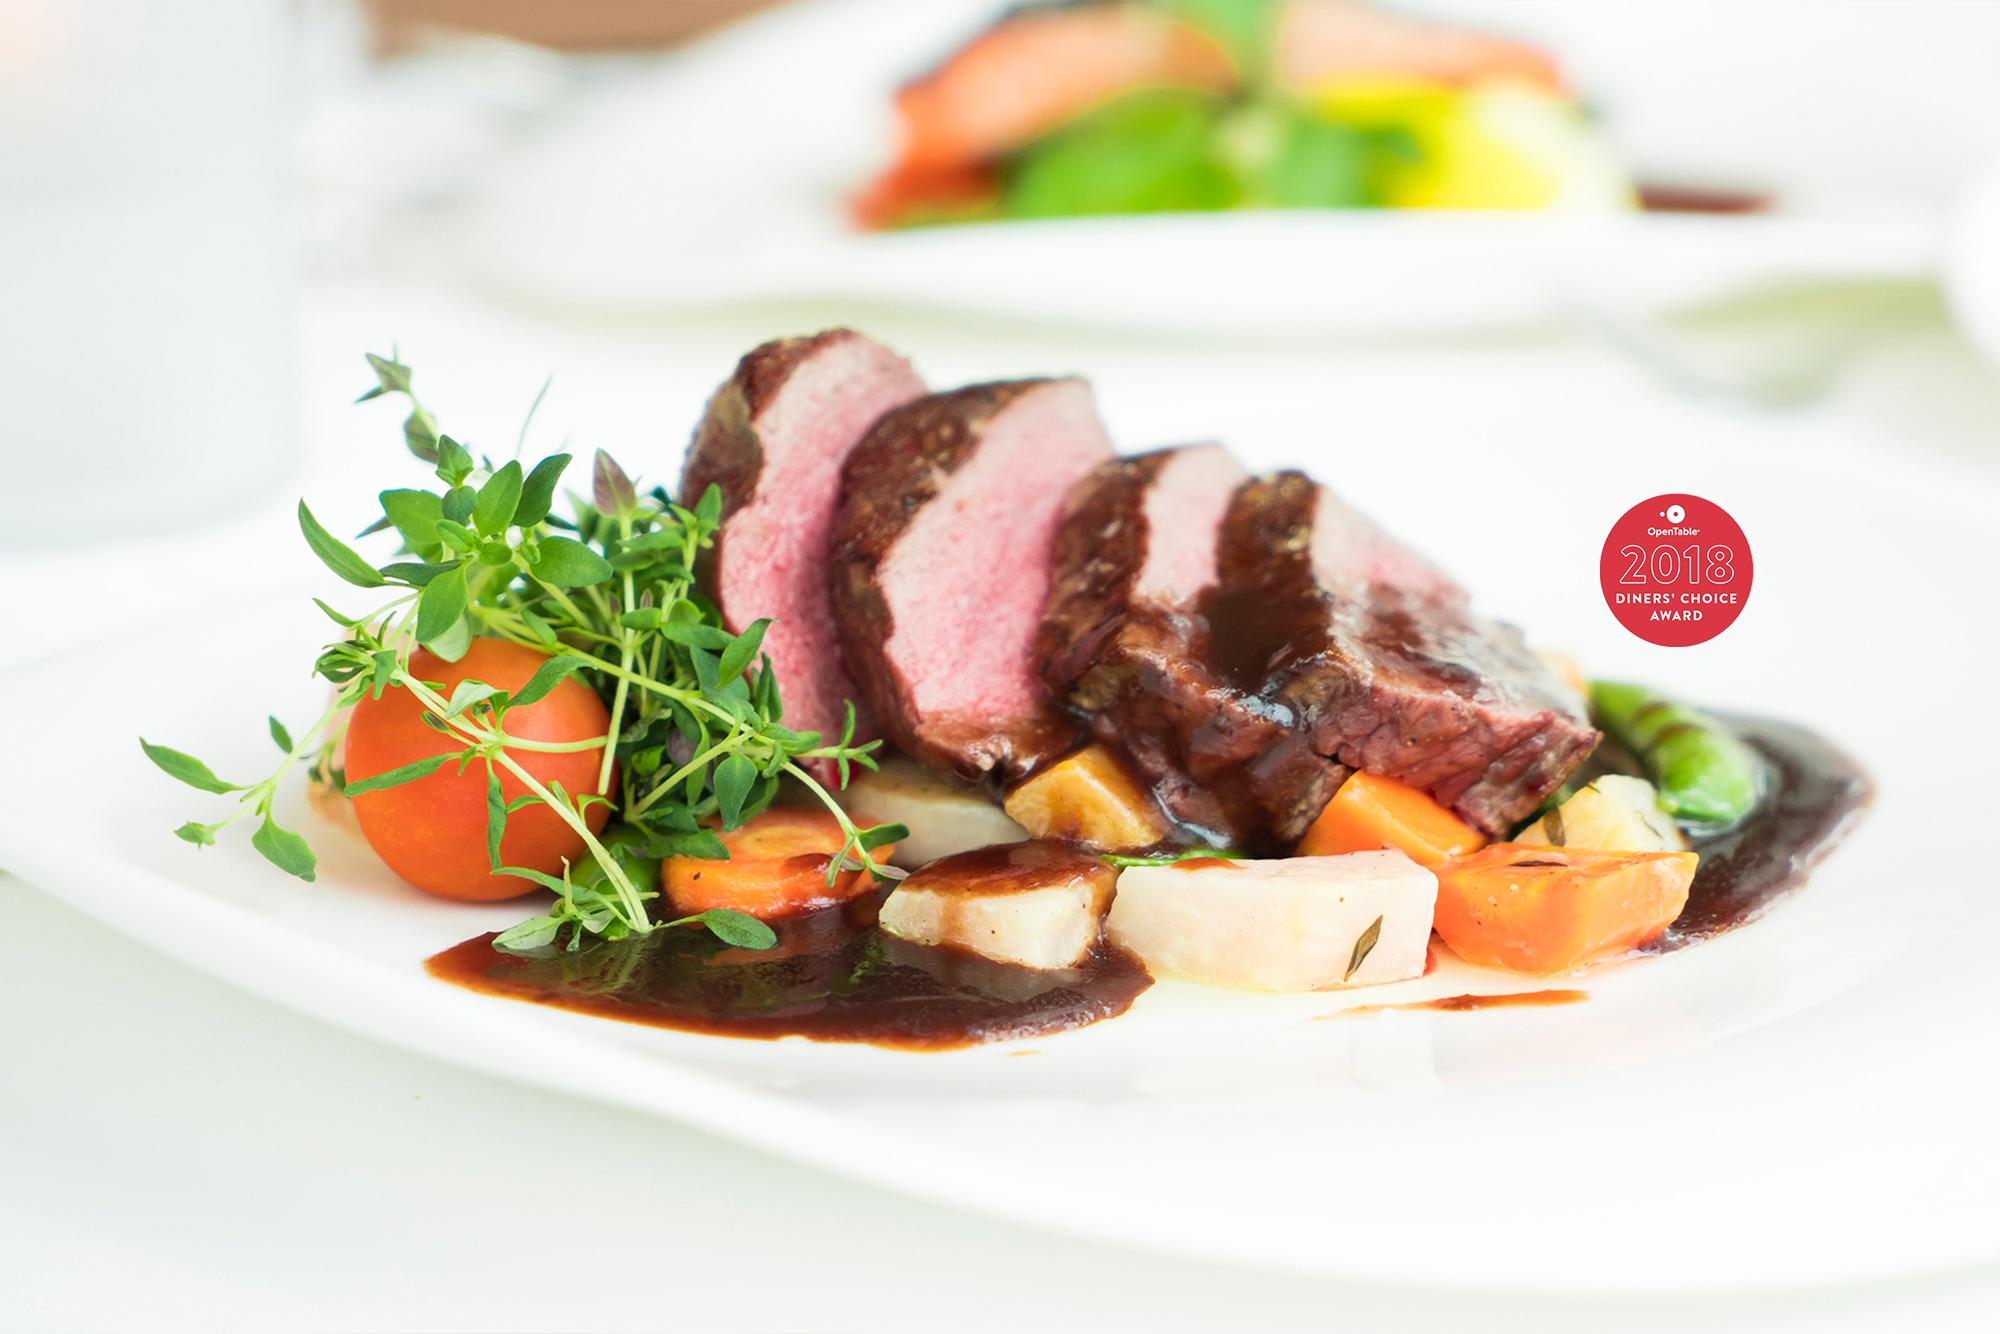 menu - Coastal New England Cuisine with a Modernistic Twist